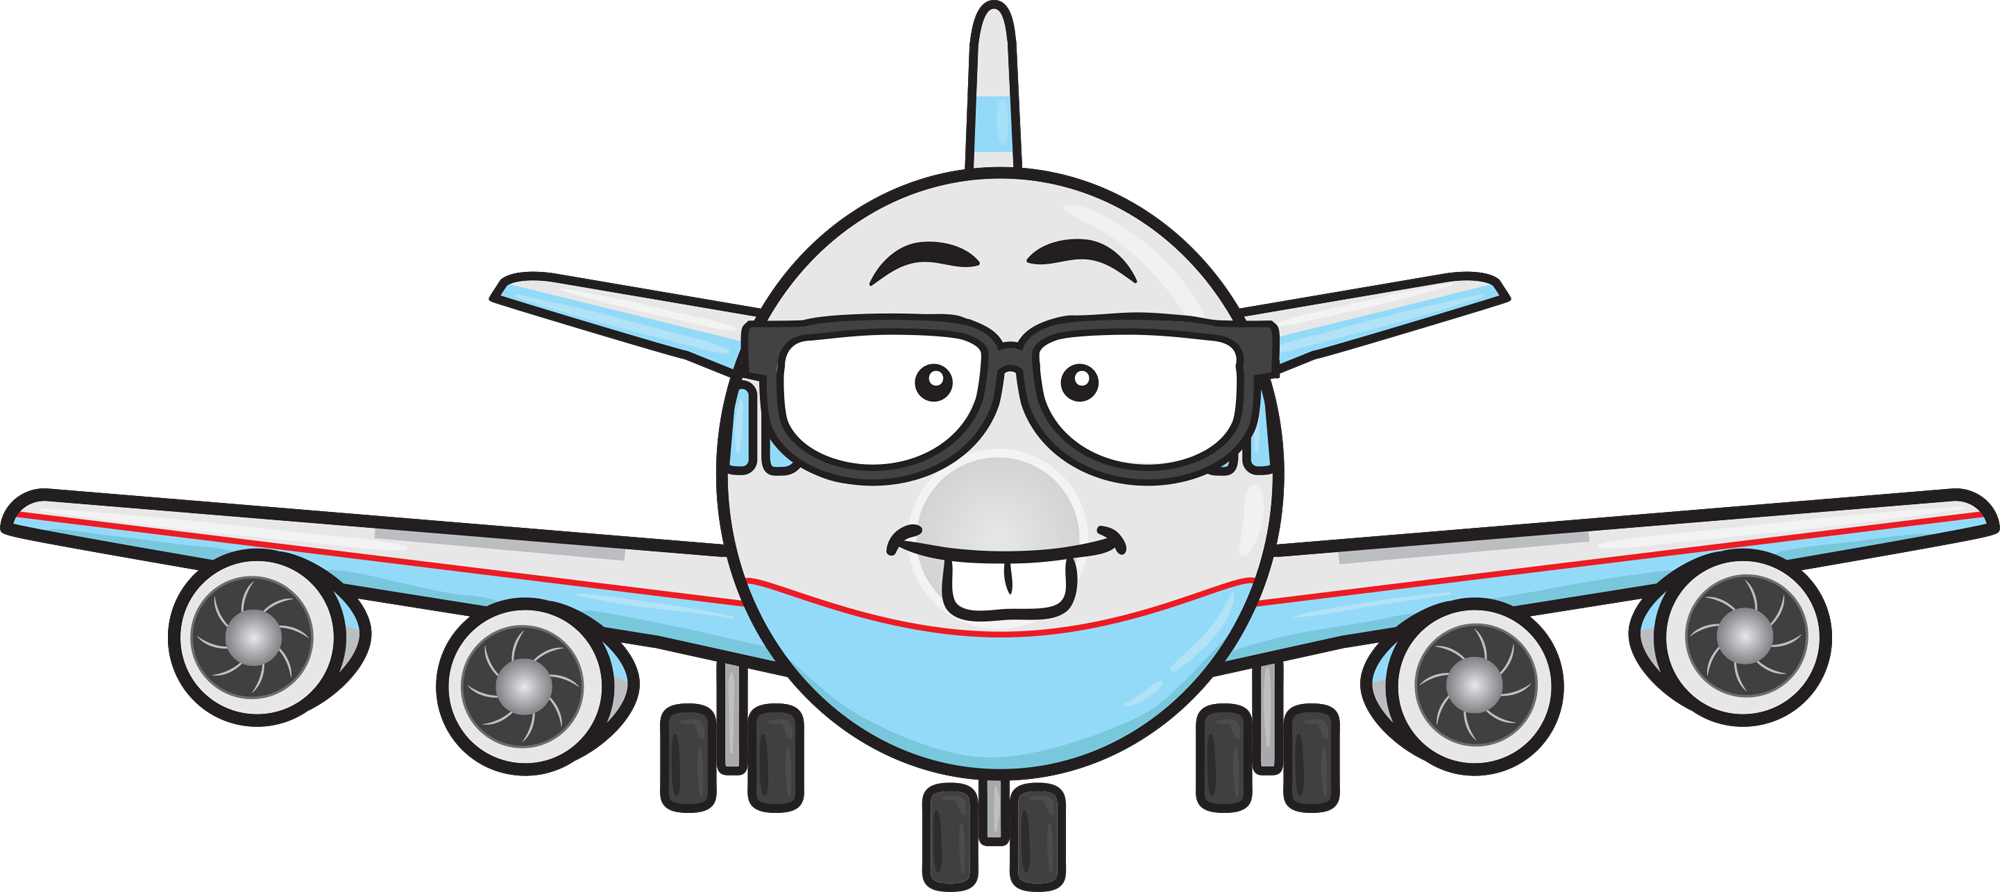 Home airplane geeks travel. Emoji clipart plane